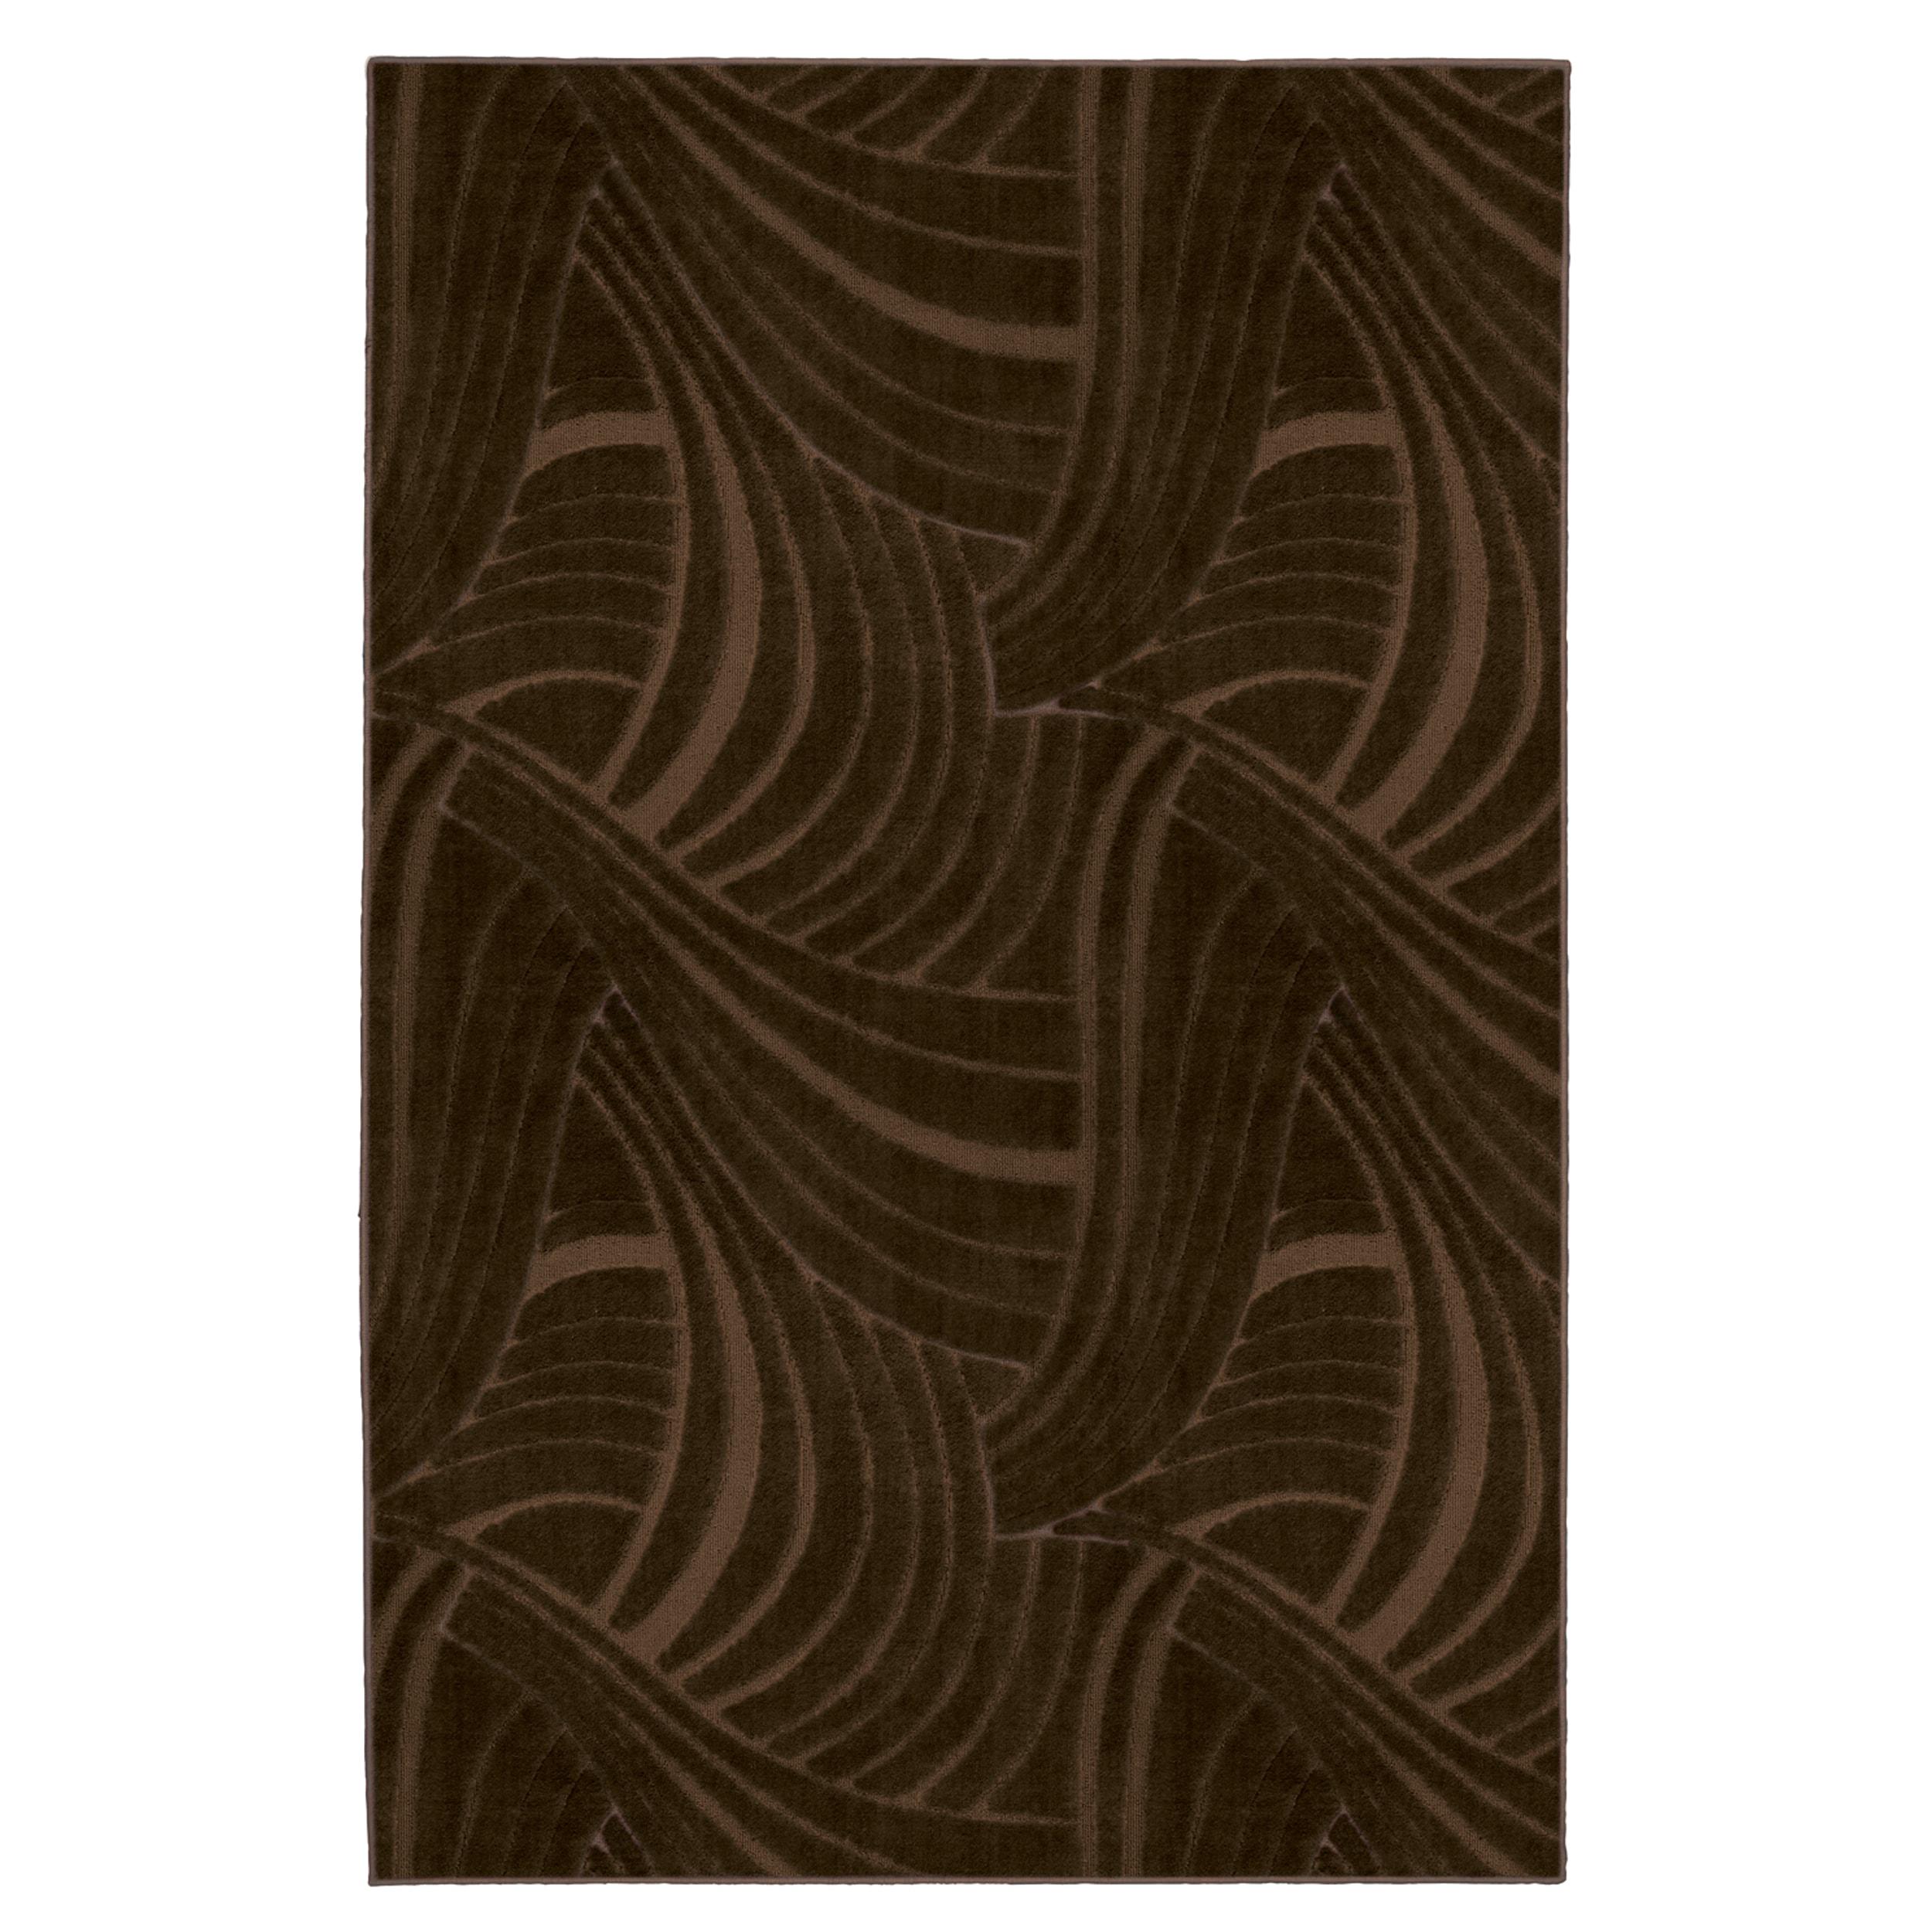 Brush Strokes Mink Brown Rug (5' x 8')